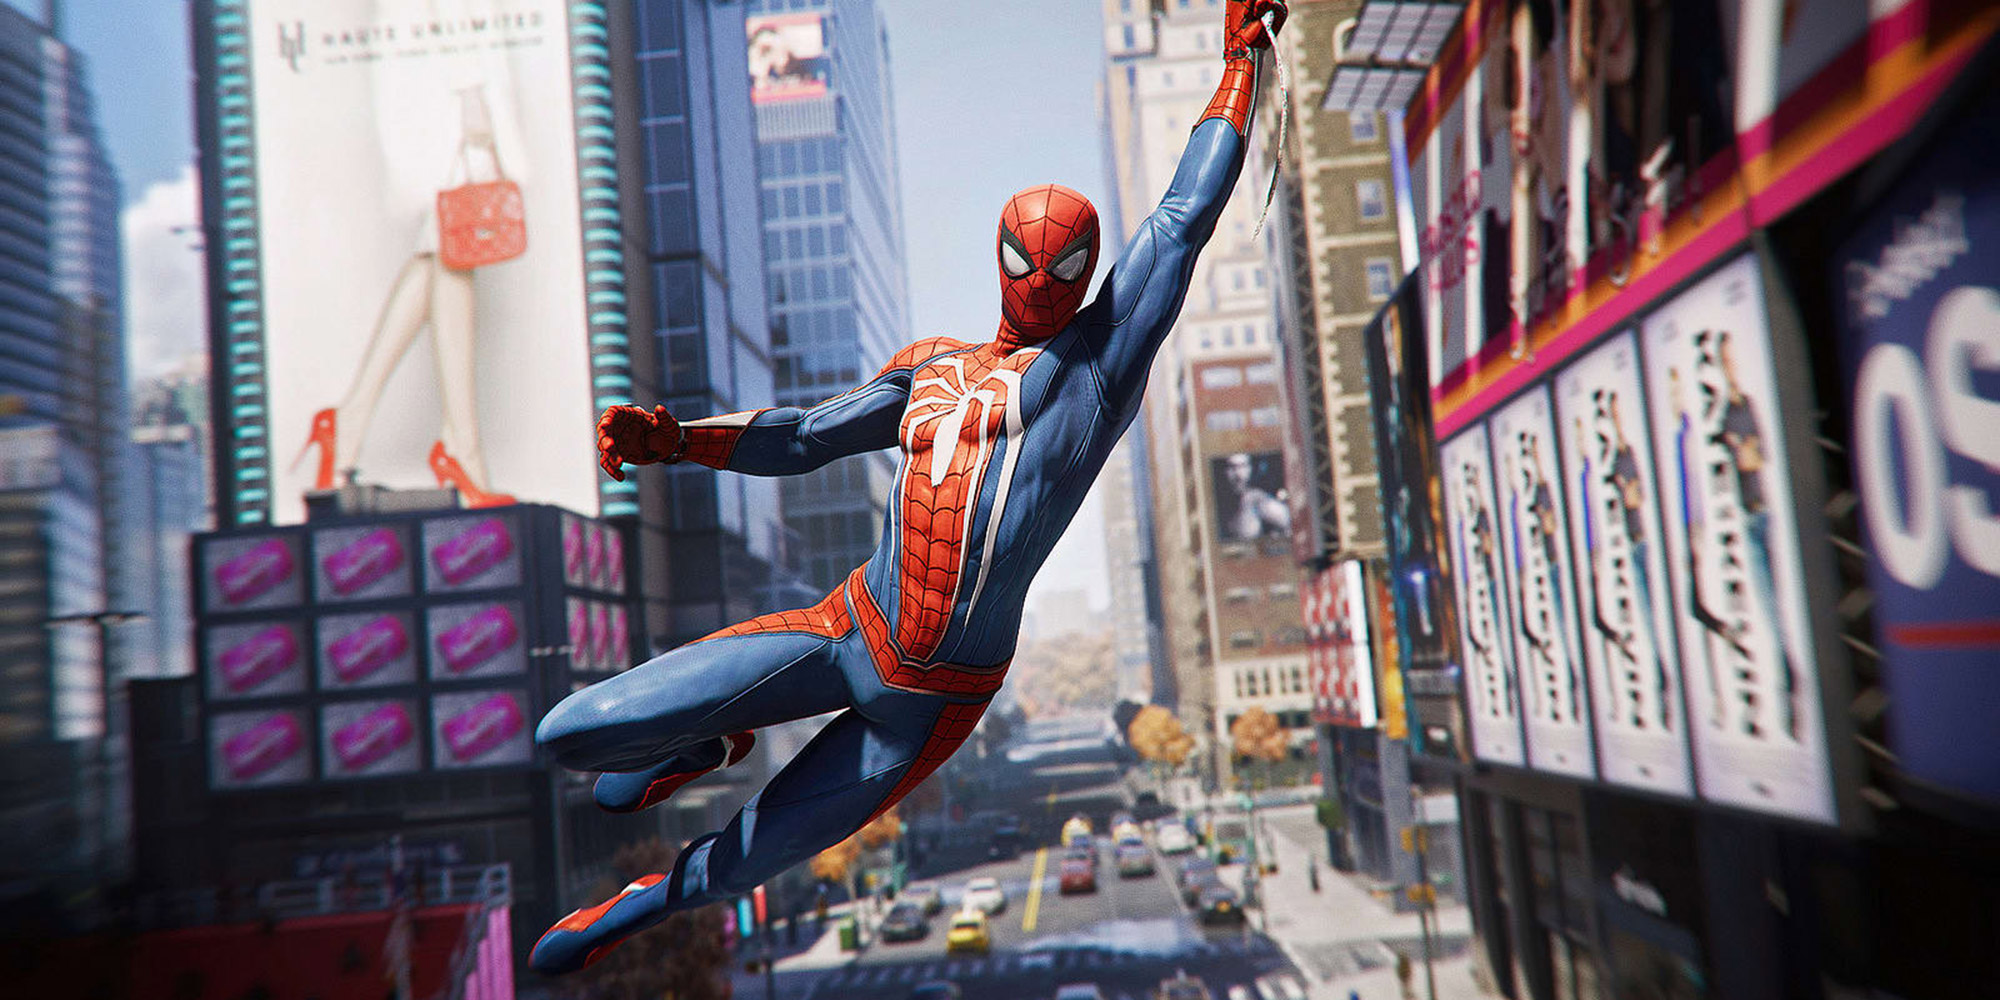 L'impressionnant open-world de Spider-Man PS4